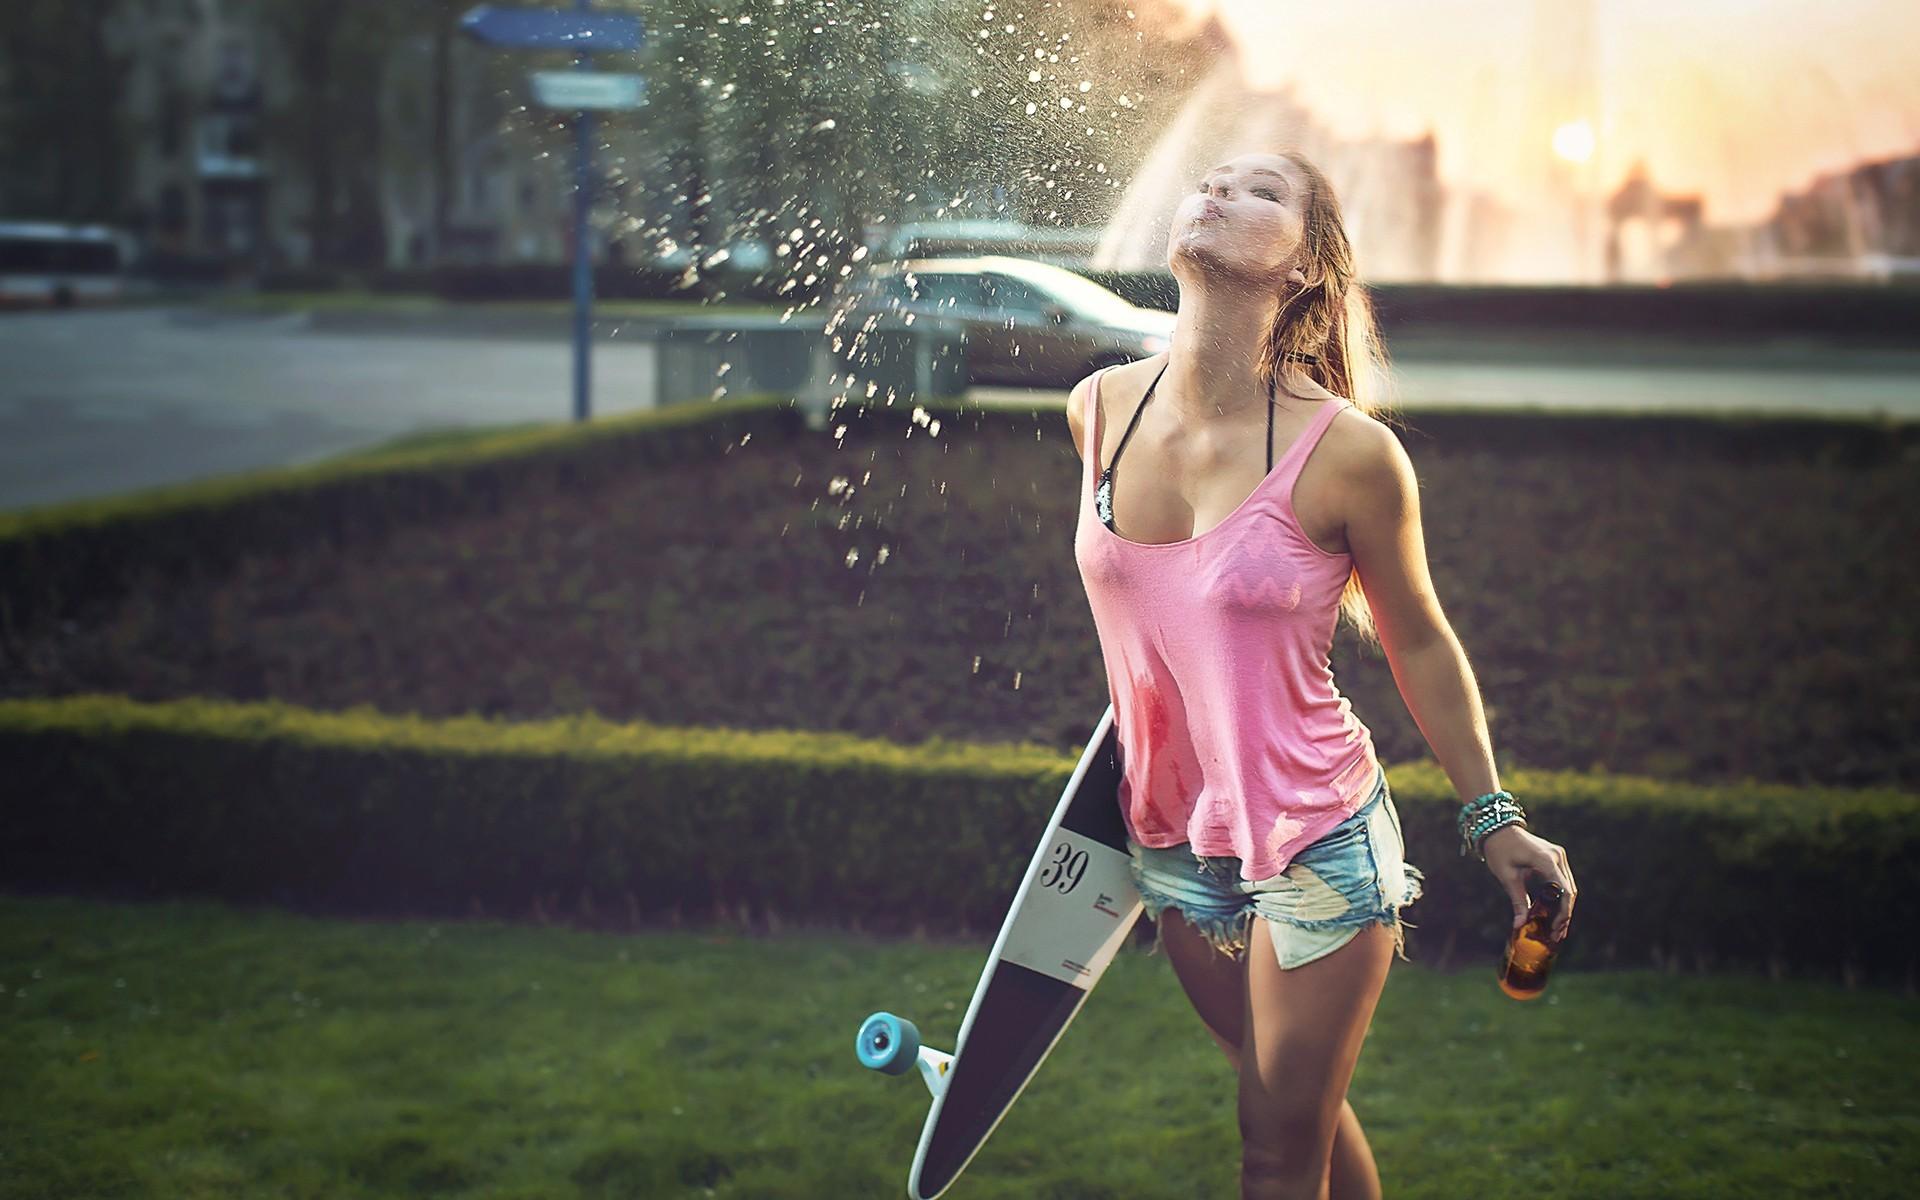 Skateboard Girl Doing Fun Summer Days Wallpaper